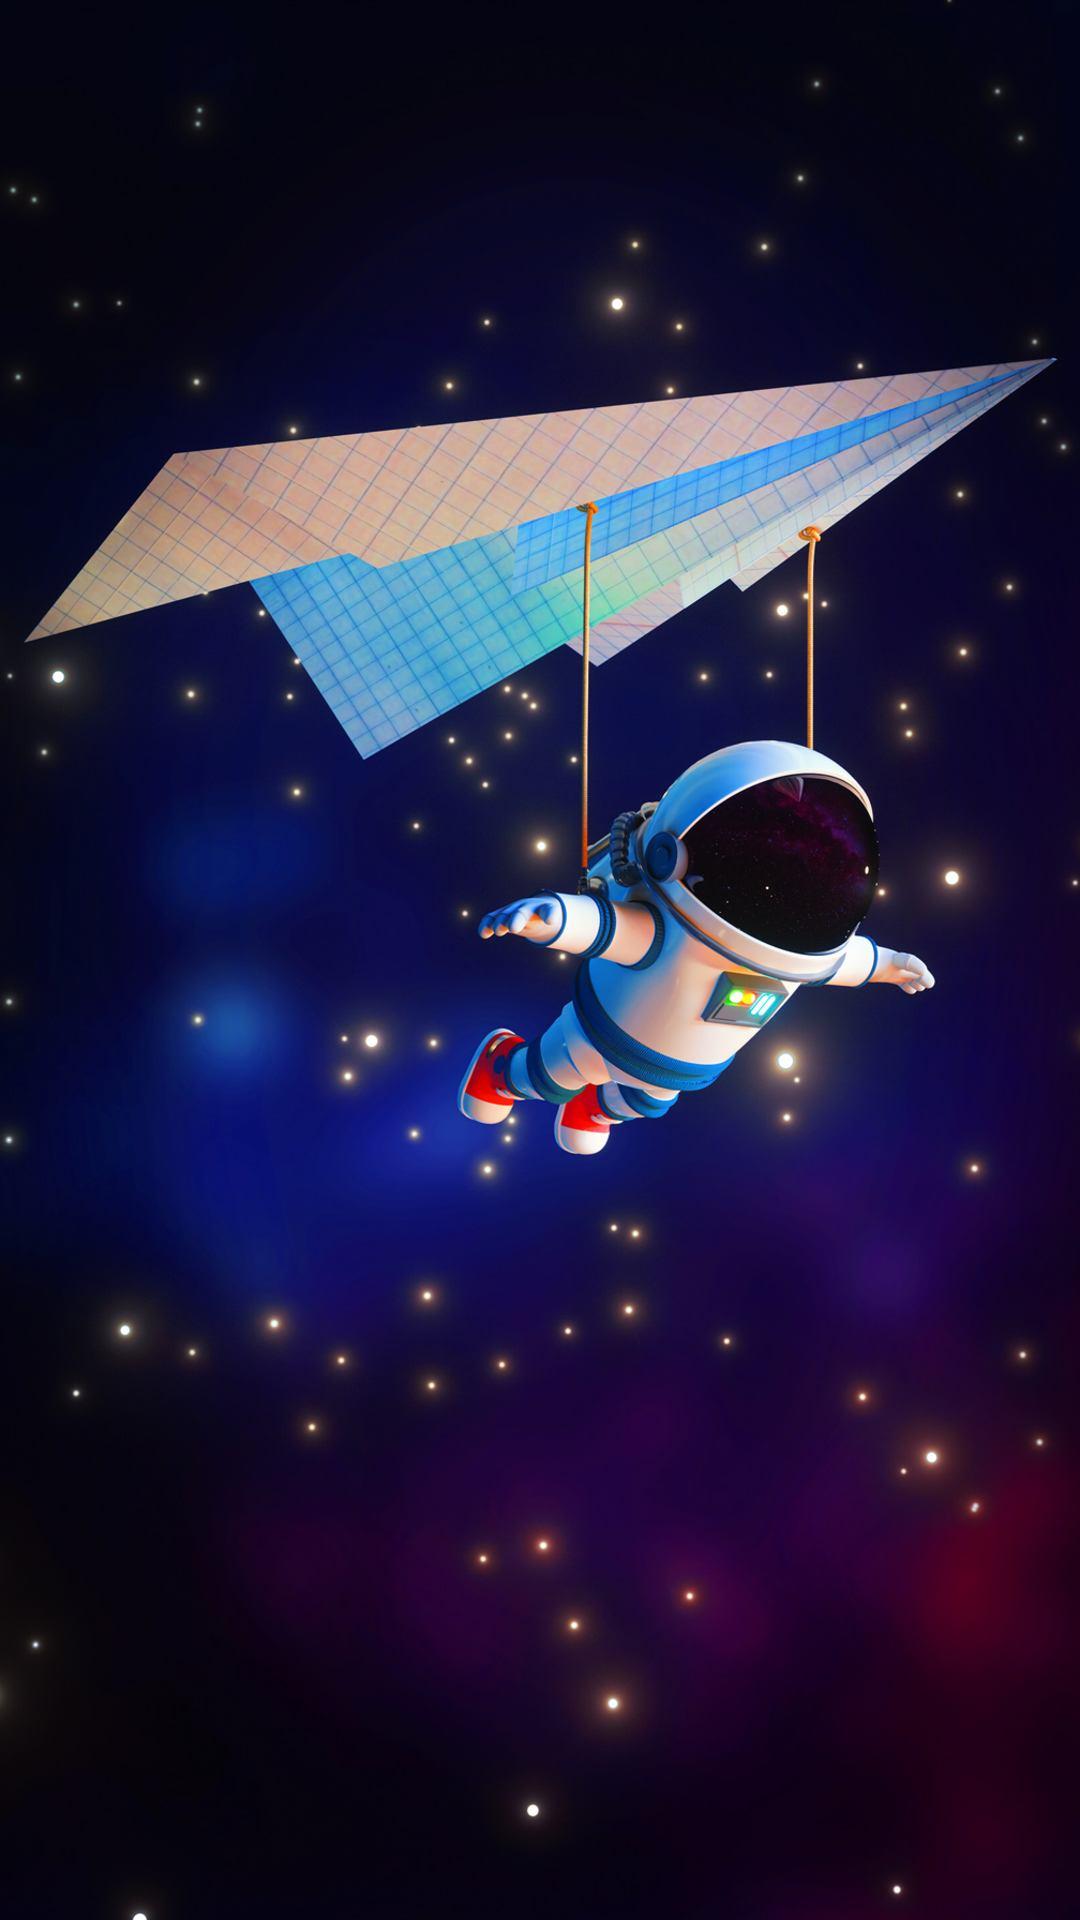 astronaut minimal 4k 8f 1080x1920 - Pack de Fondos de Pantalla Minimalistas (+100 Imagenes)